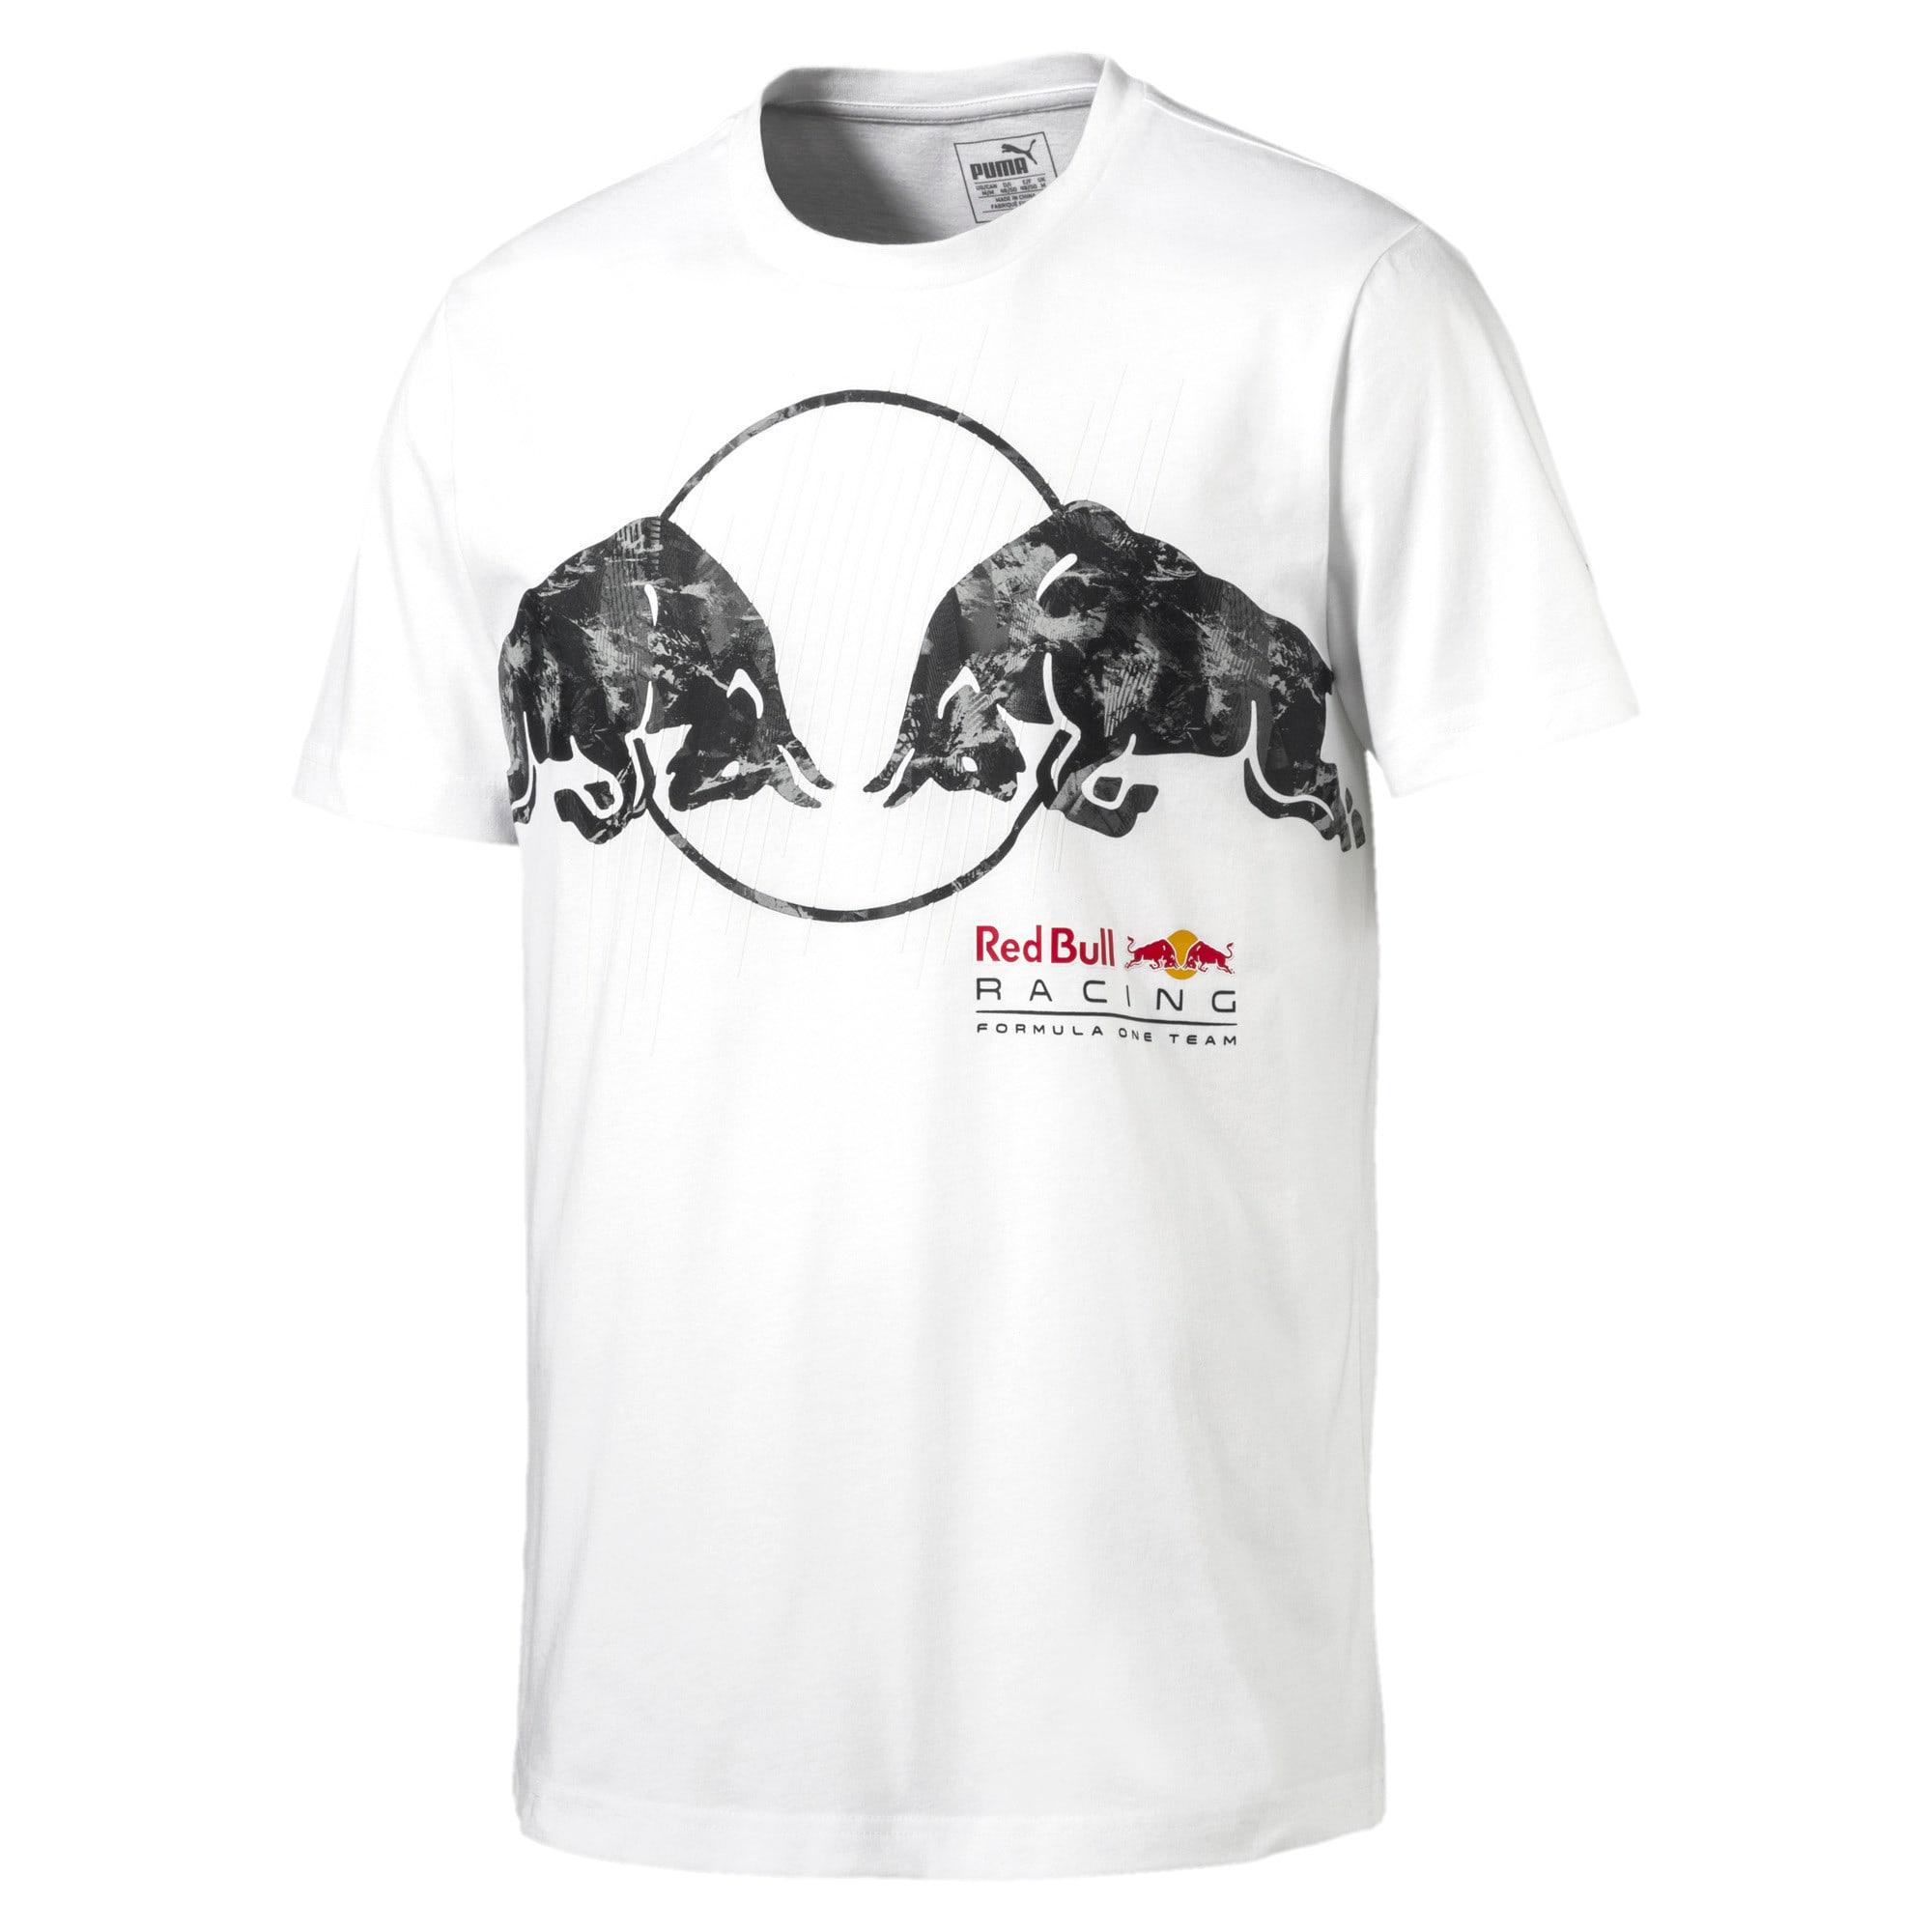 Thumbnail 4 of Red Bull Racing Men's Graphic T-Shirt, Puma White, medium-IND